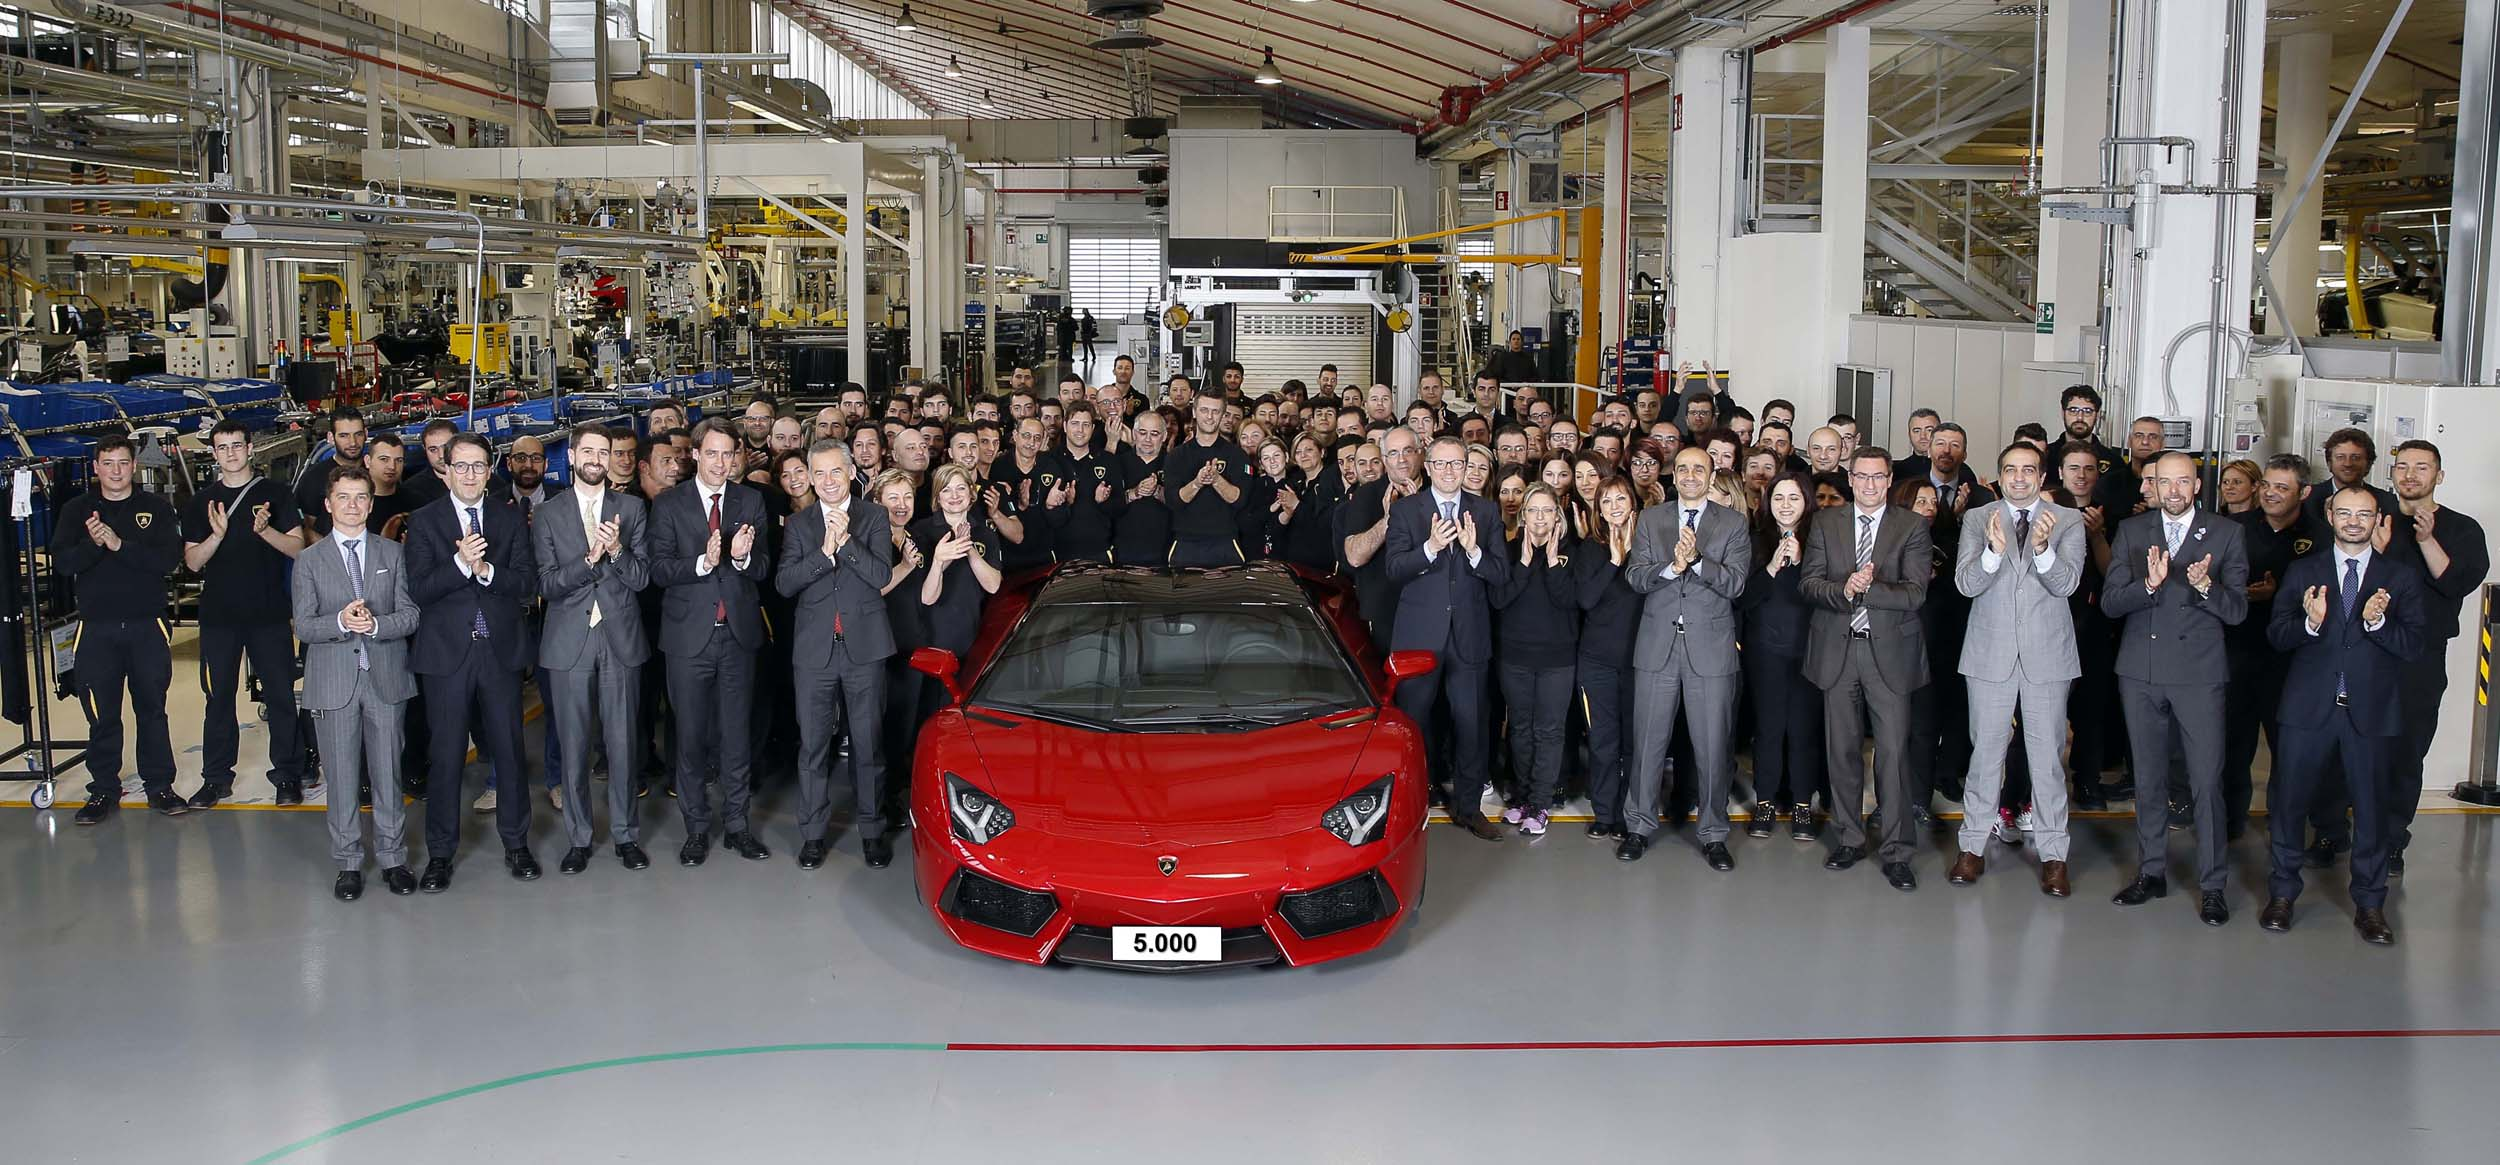 Lamborghini builds 5,000th Aventador